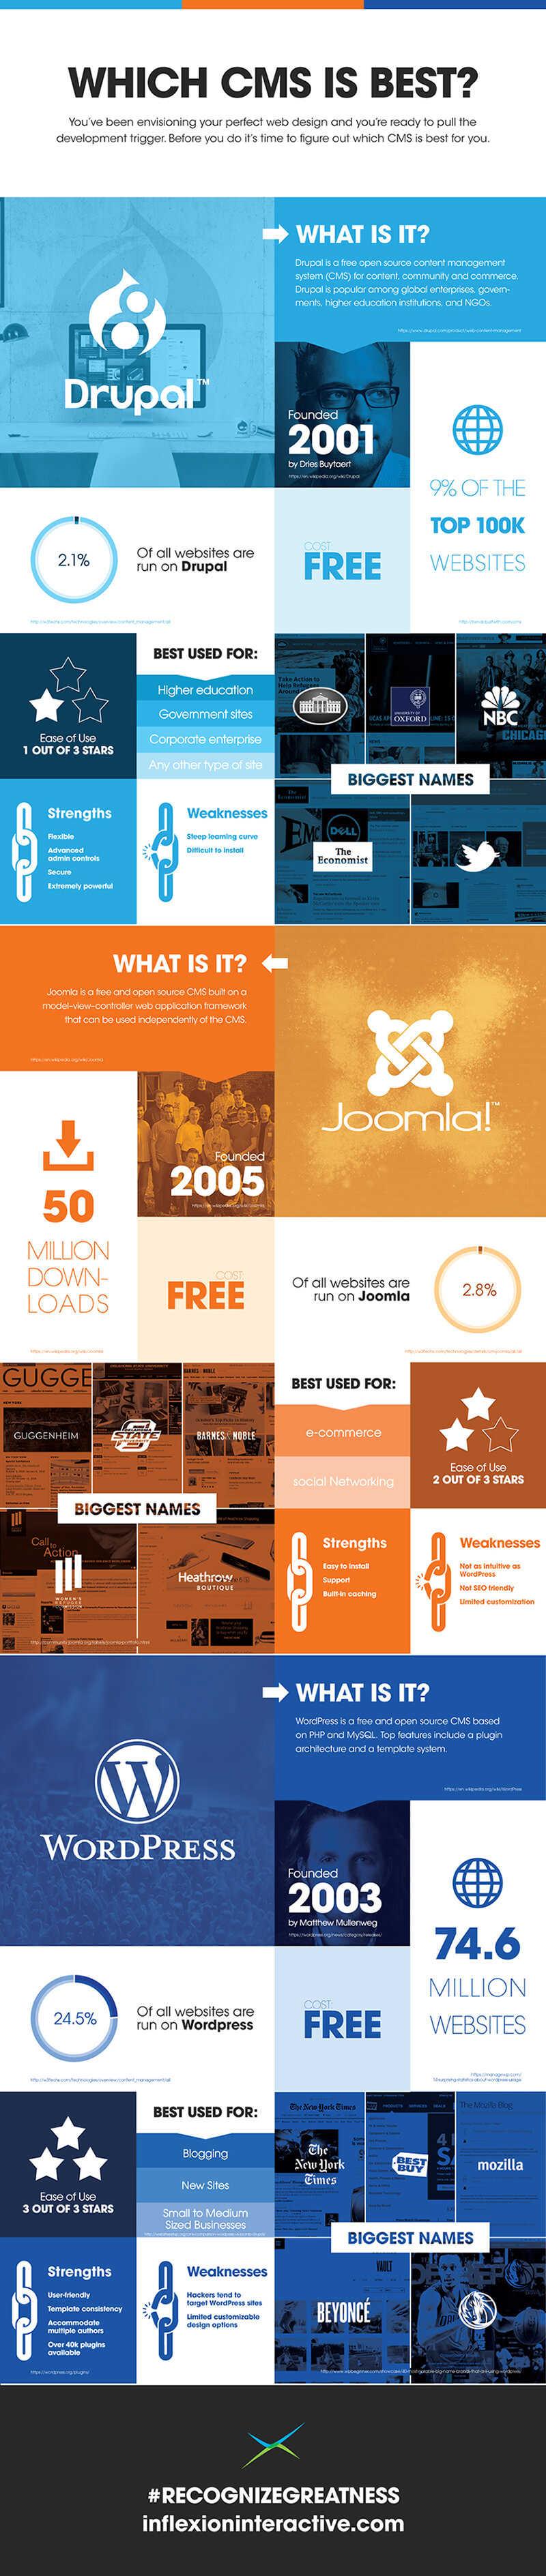 Wordpress-Drupal-Joomla_Infographic_Final